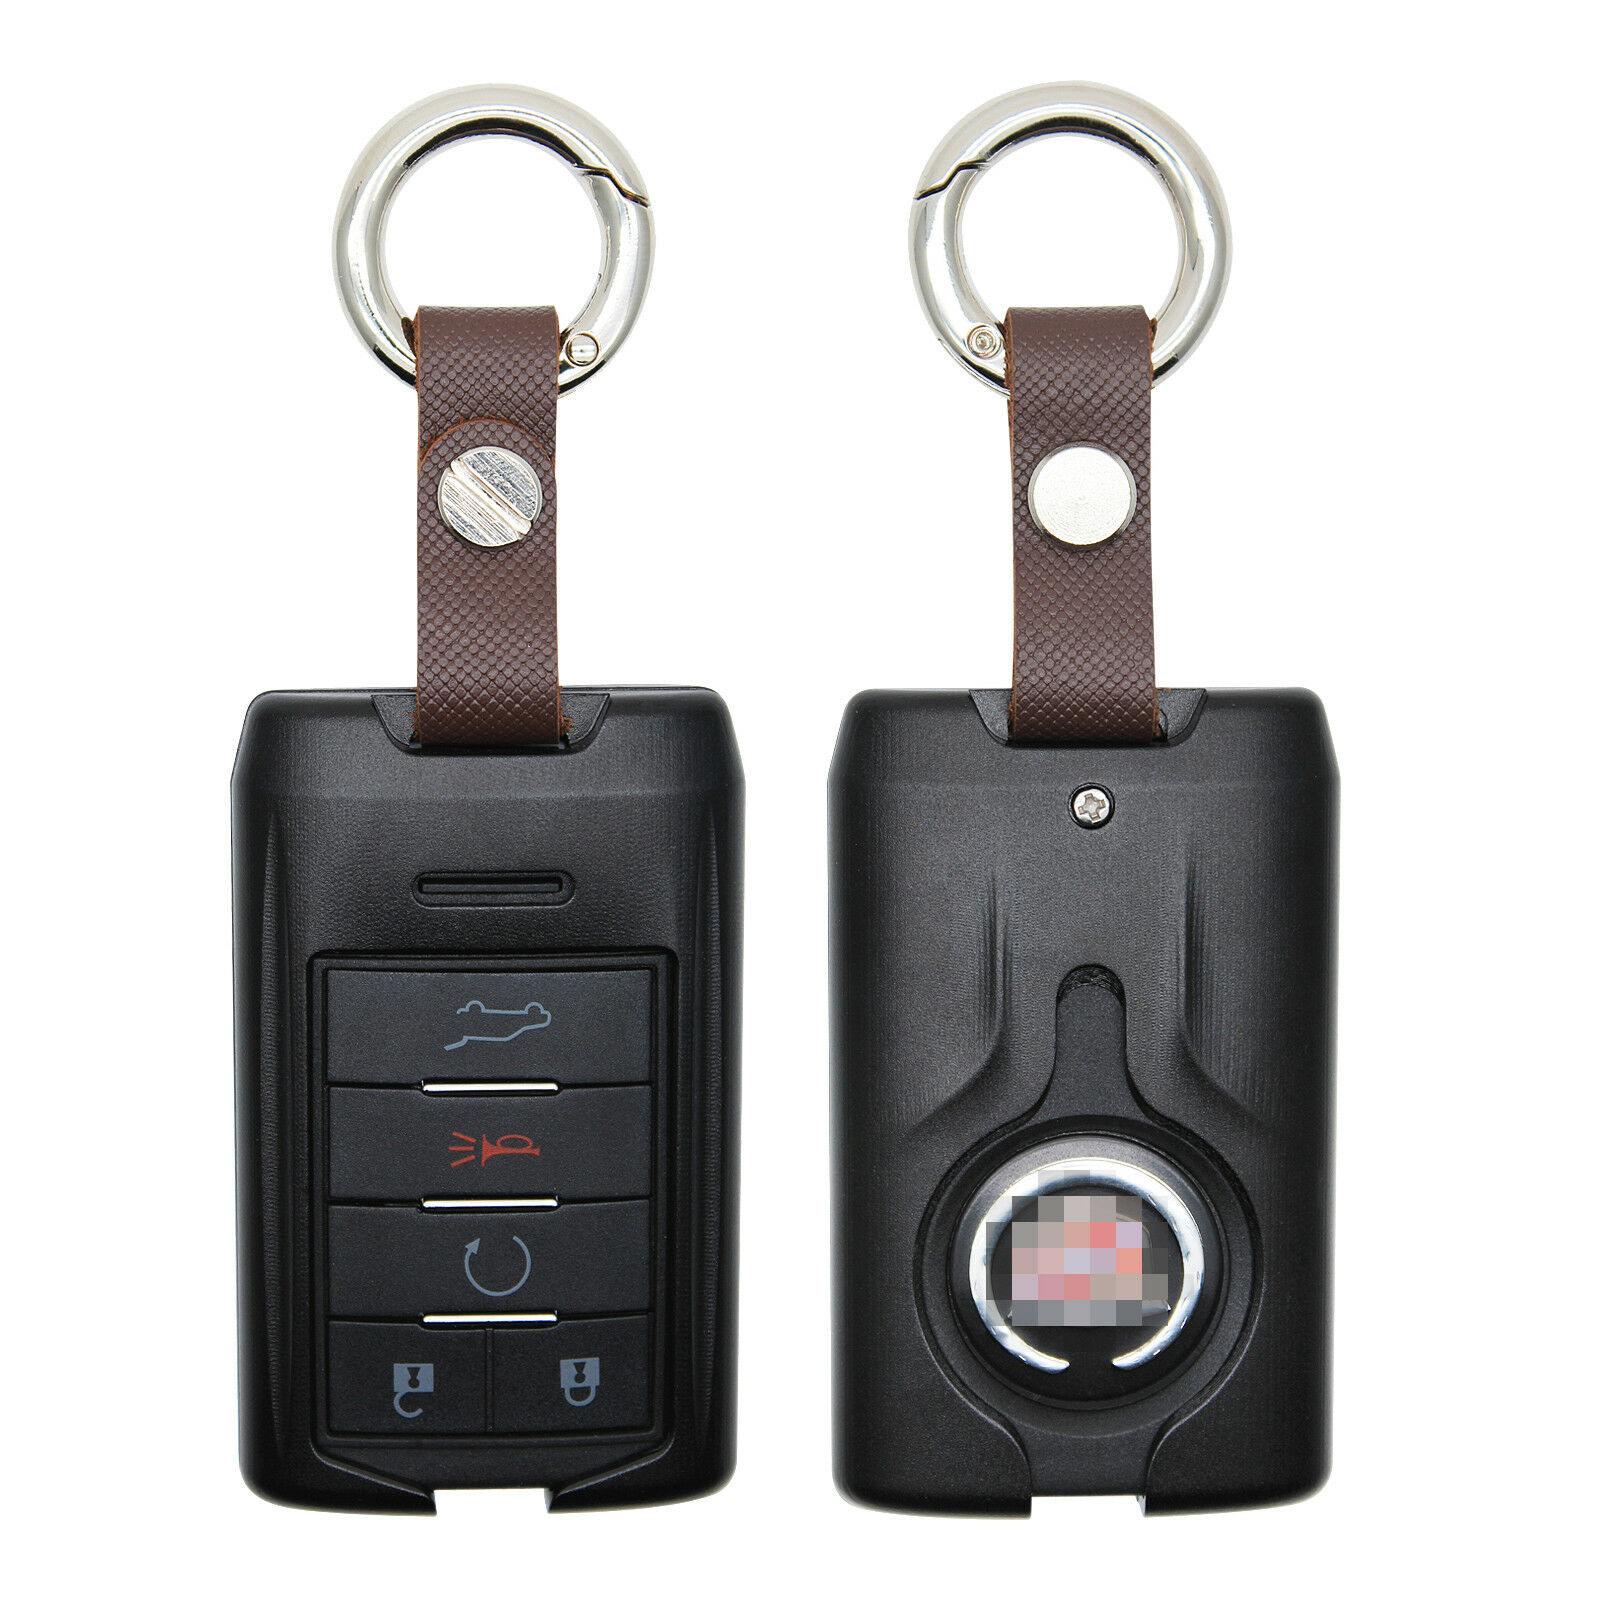 Aluminium Remote Fob Key Black Case for 2007-2014 Cadillac Escalade SRX CTS